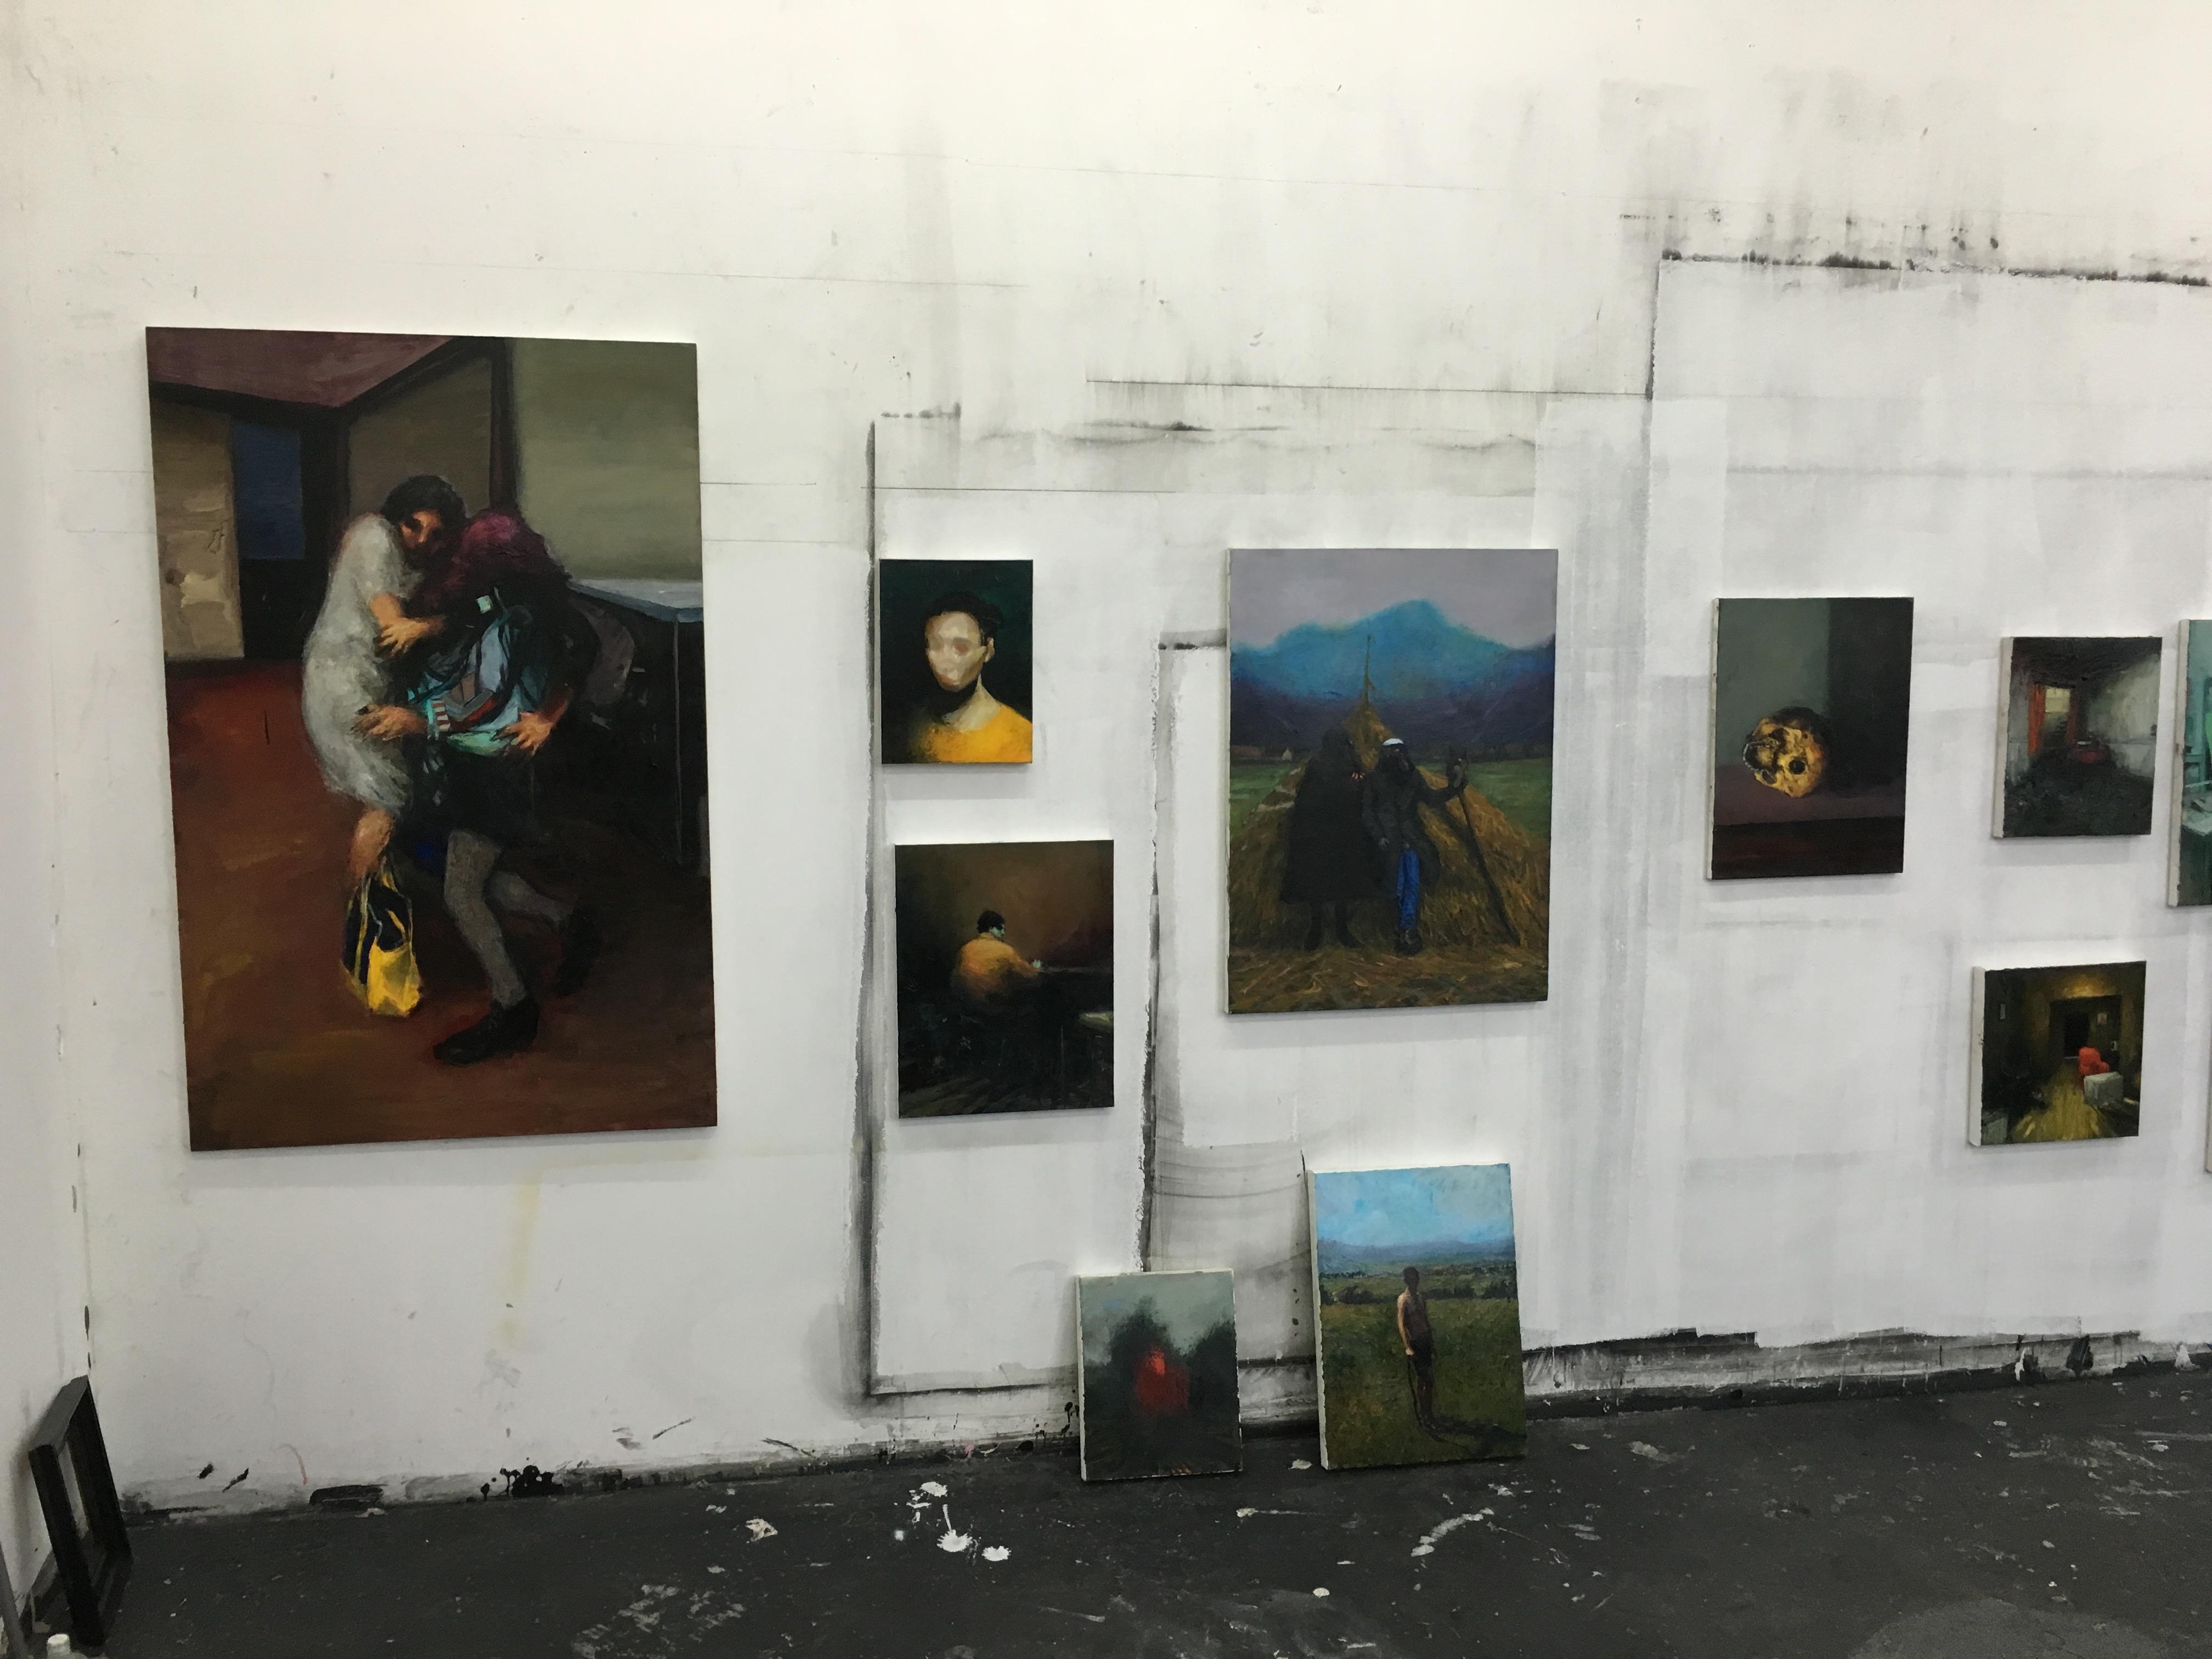 Szabolcs Veres Arbeiten in seinem Atelier in der Fabrica de Peinsule im Februar 2016, Cluj, Rumänien